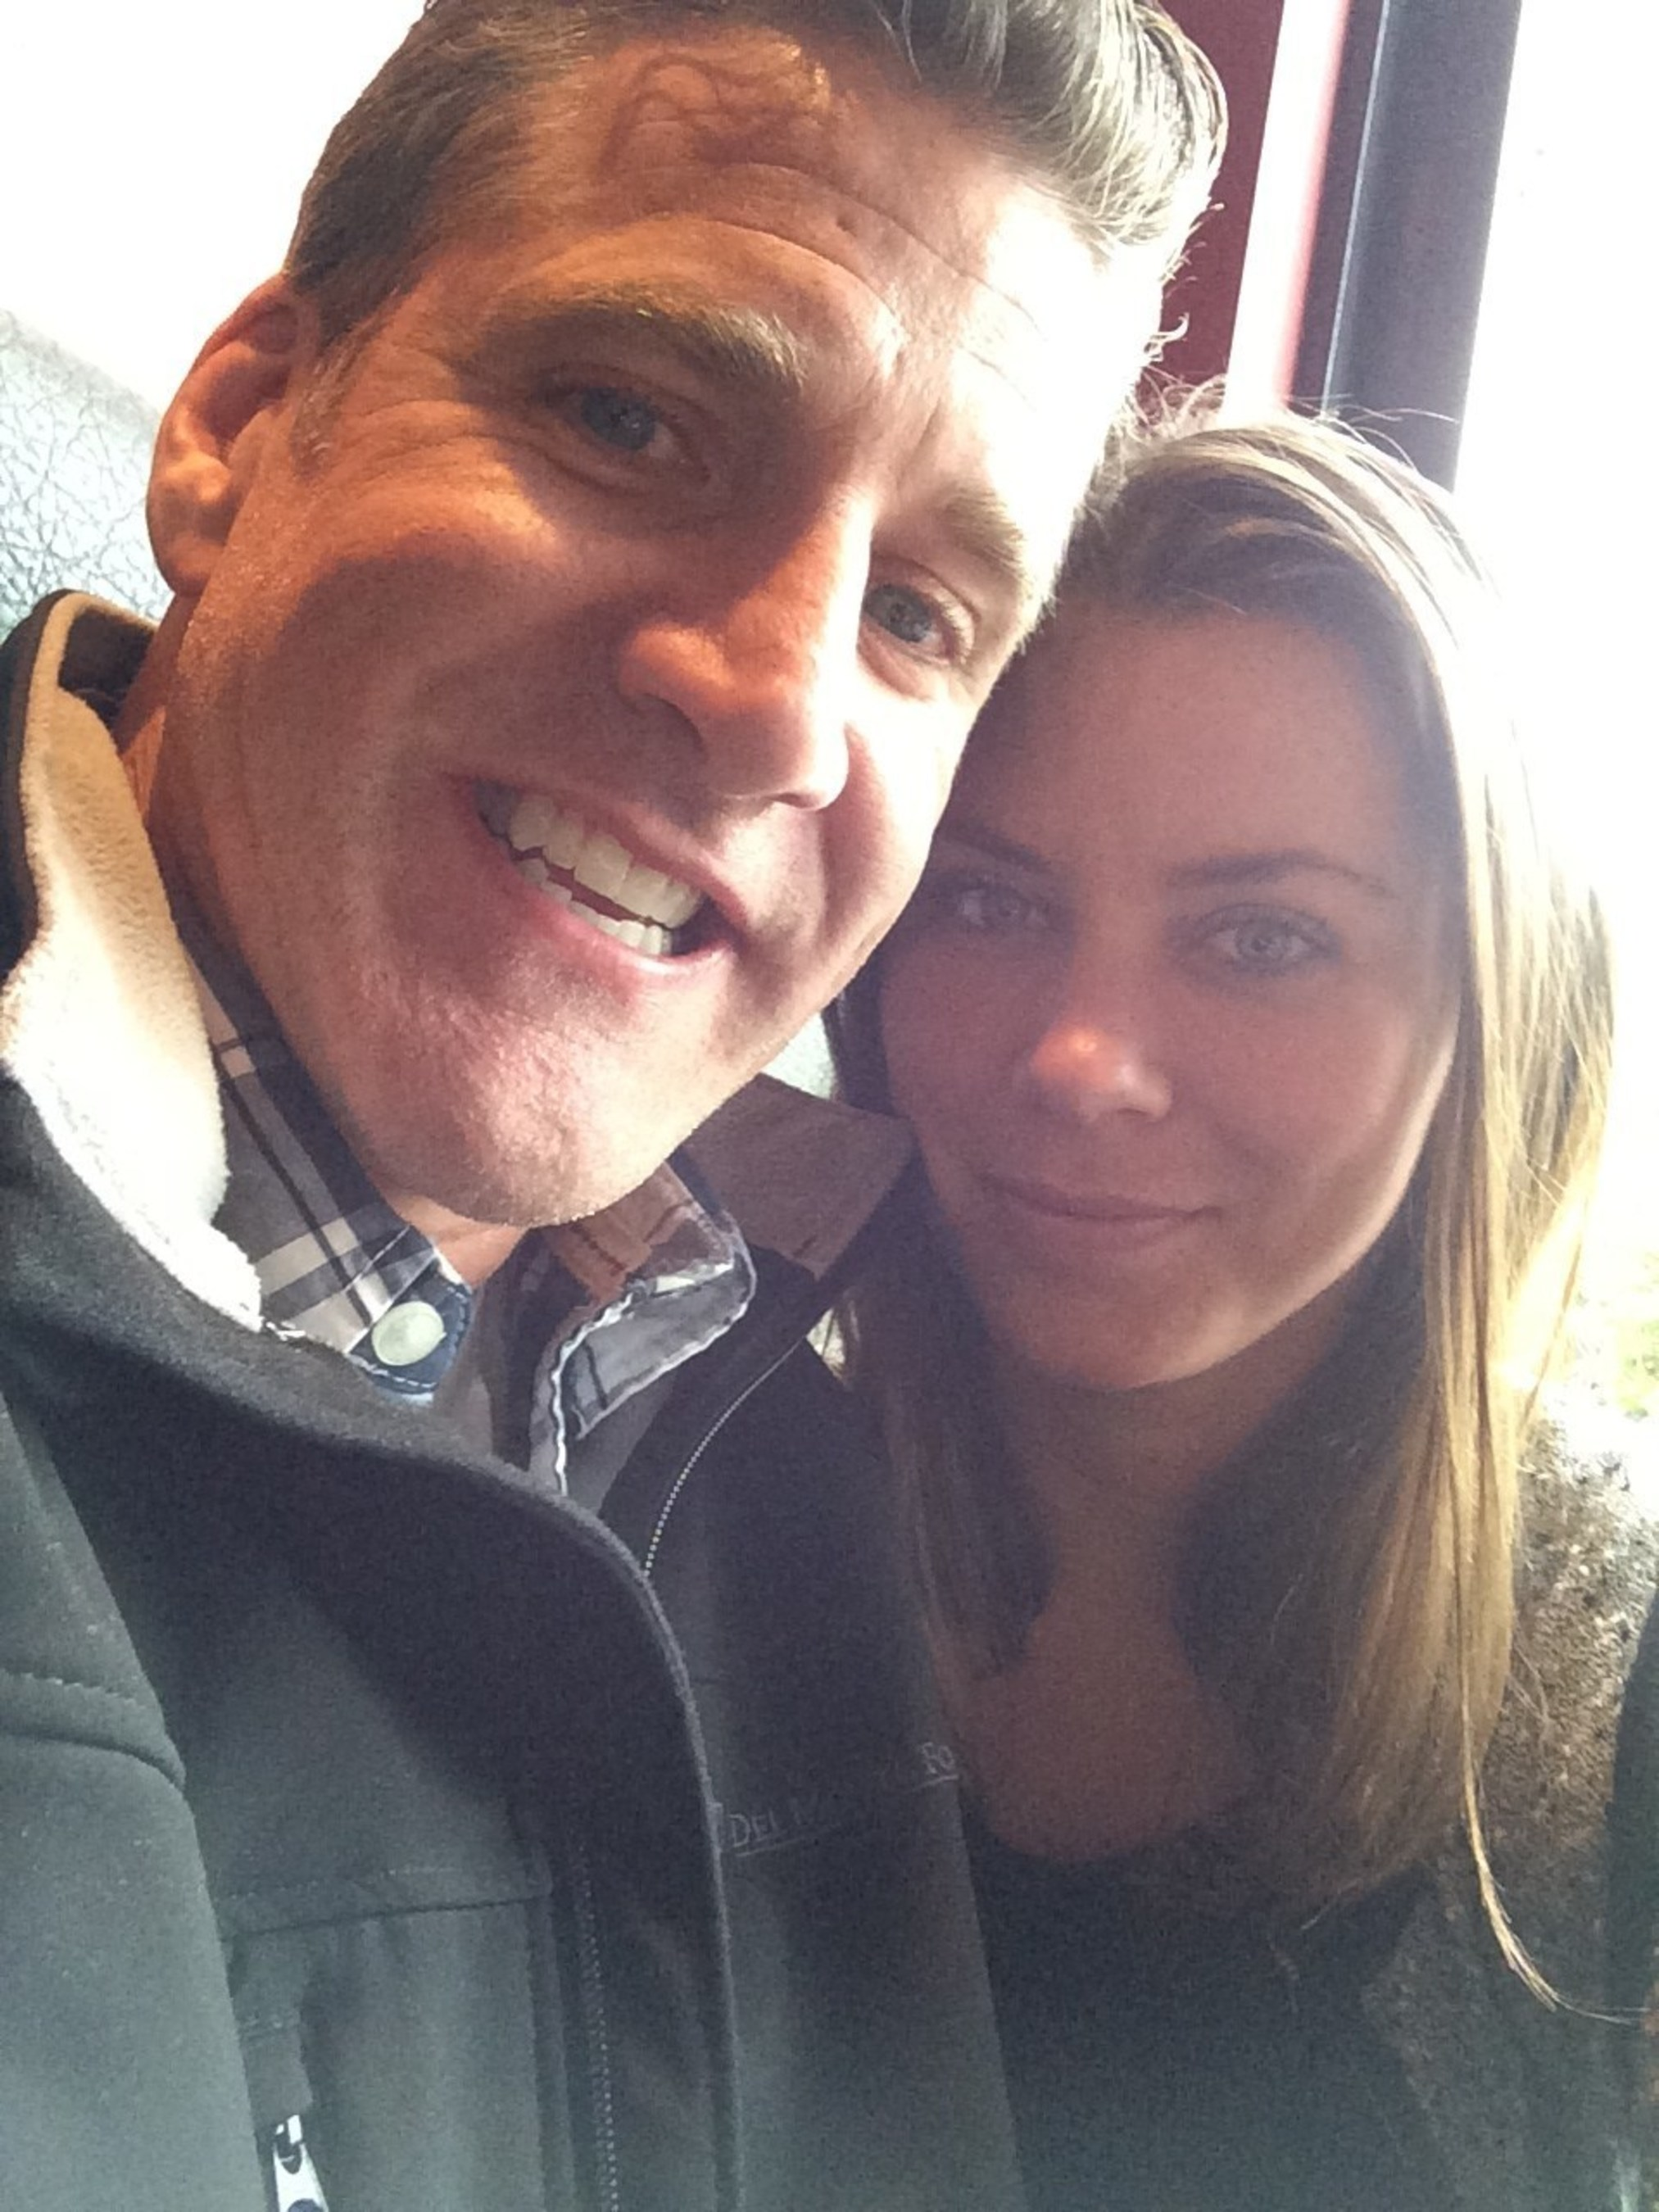 Dan Diaz and wife Brittany Maynard in 2014